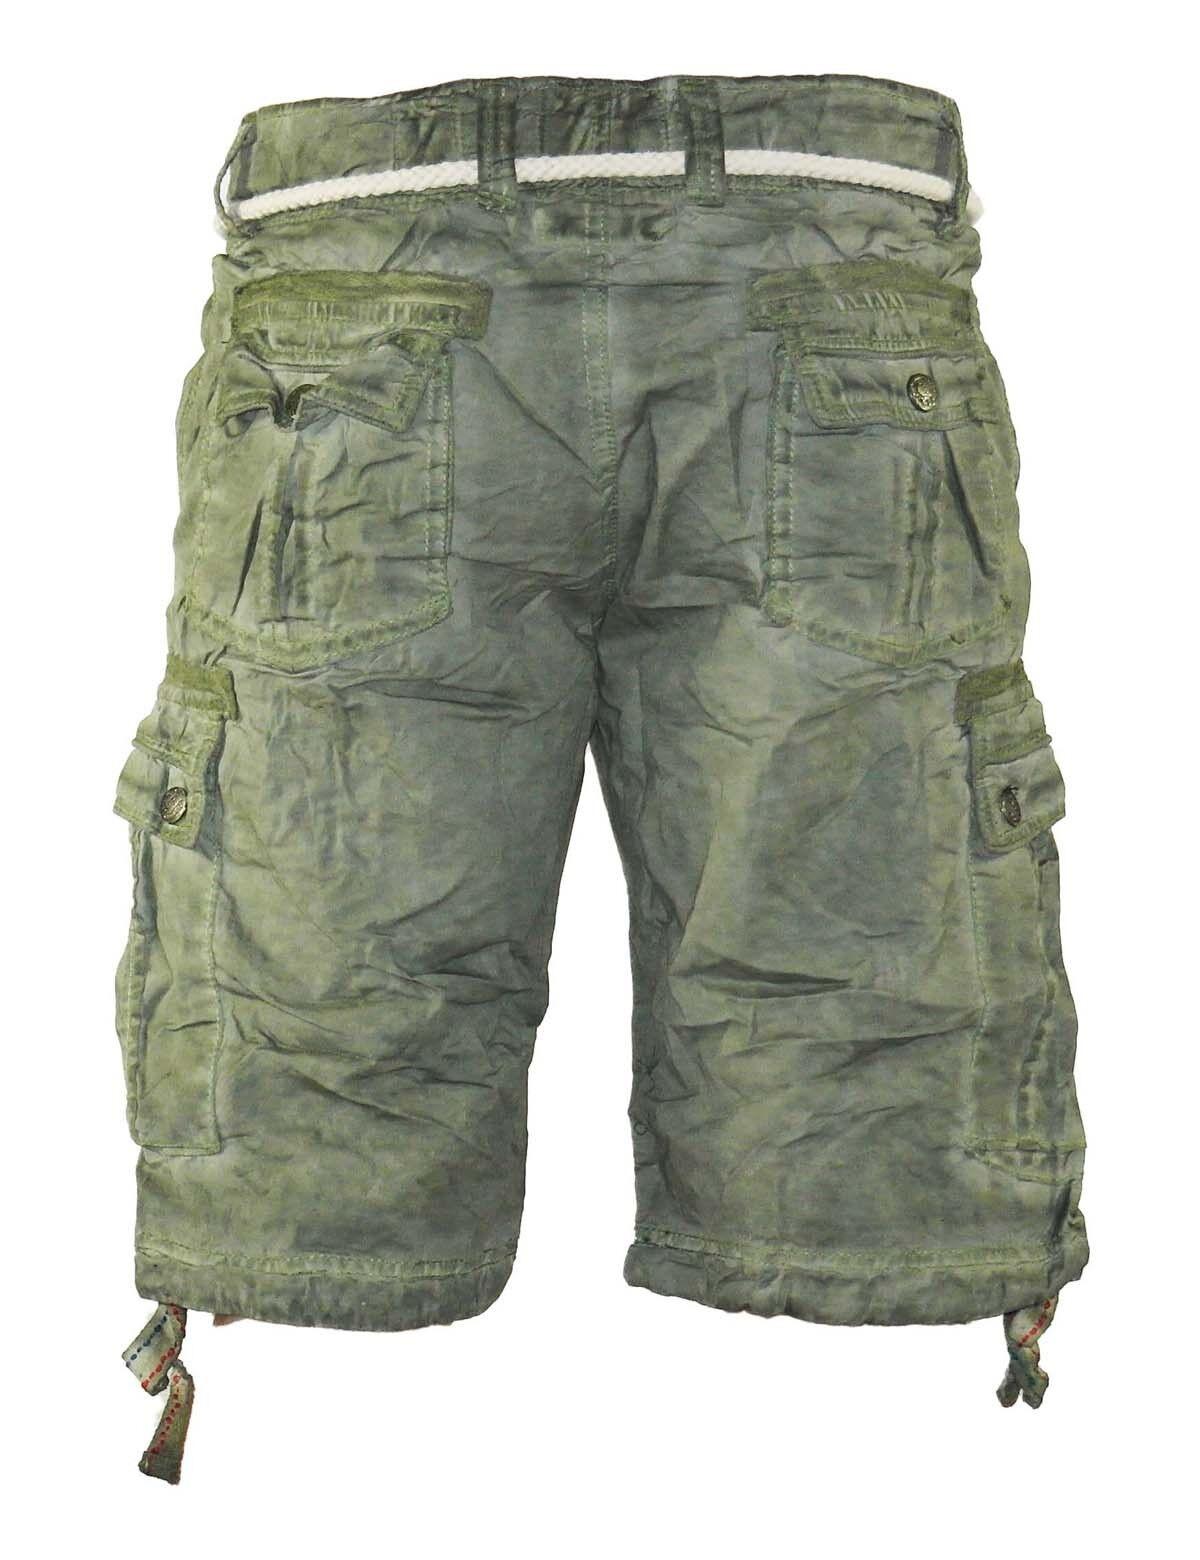 dcd1b767c354ba ... Herren Jeans kurze Hose lange Cargo Shorts Bermuda Caprihose mit Gürtel  8835 2 ...